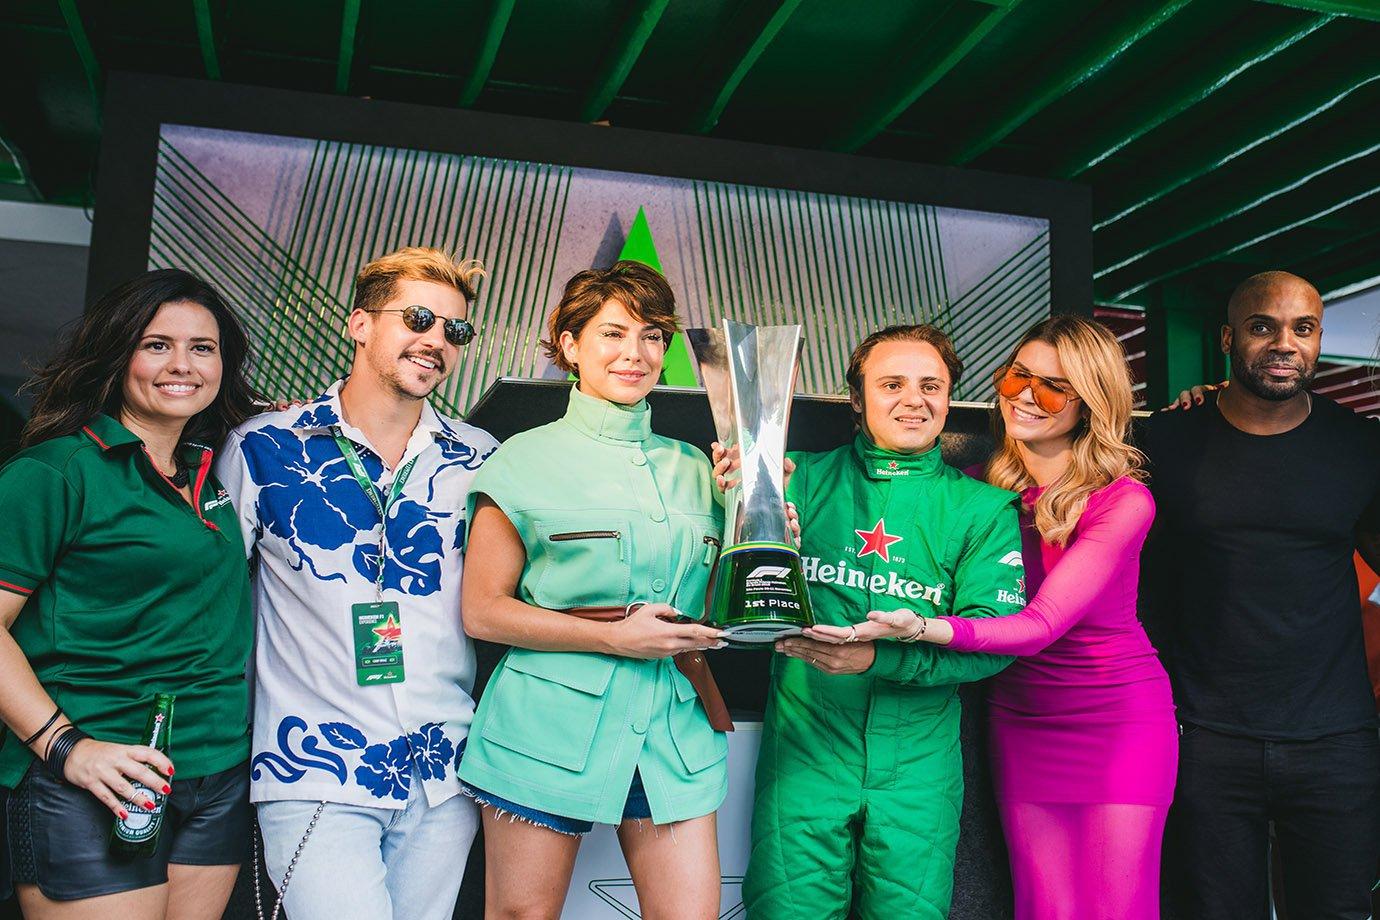 Vanessa Brandão, Caio Braz, Fernanda Paes Leme, Felipe Massa, Julia Faria e Rafael Zulu durante evento da Heineken no Rio